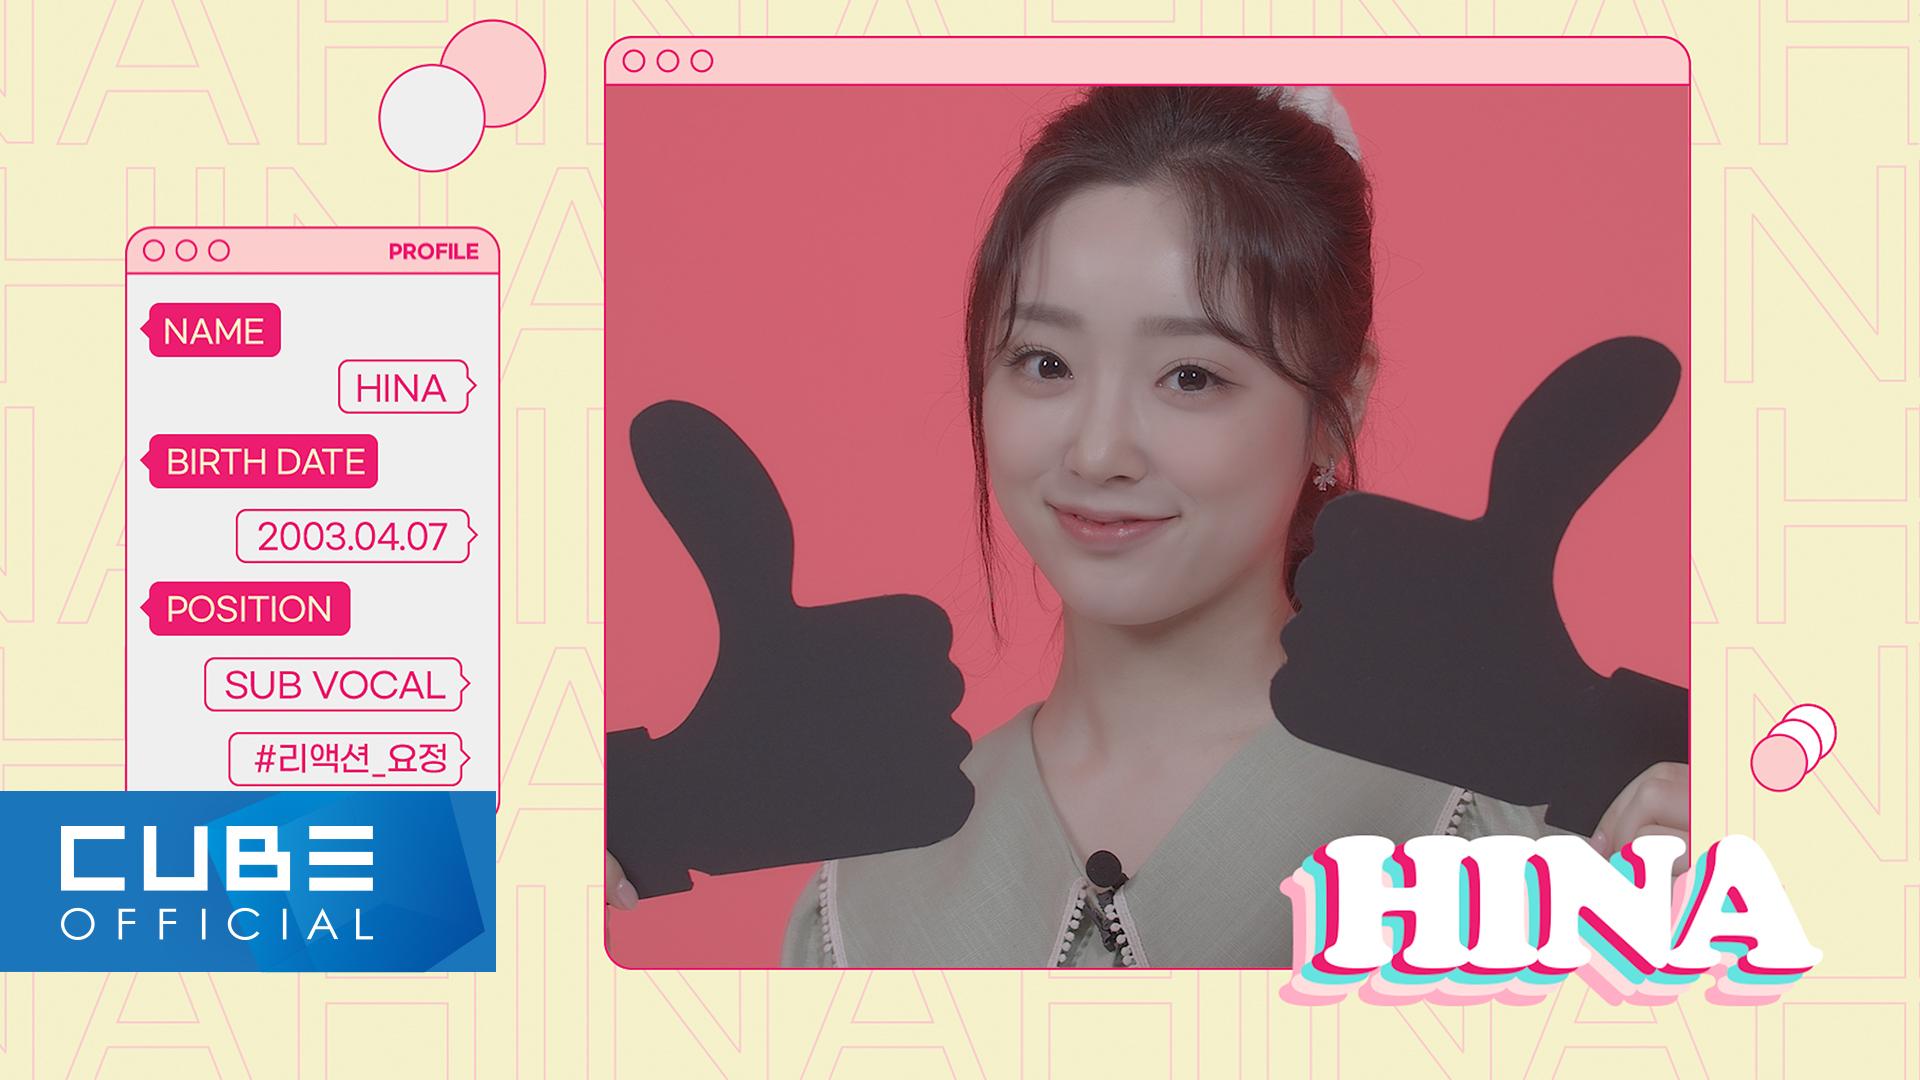 LIGHTSUM - PR INTERVIEW 'In My Life' : 히나 HINA